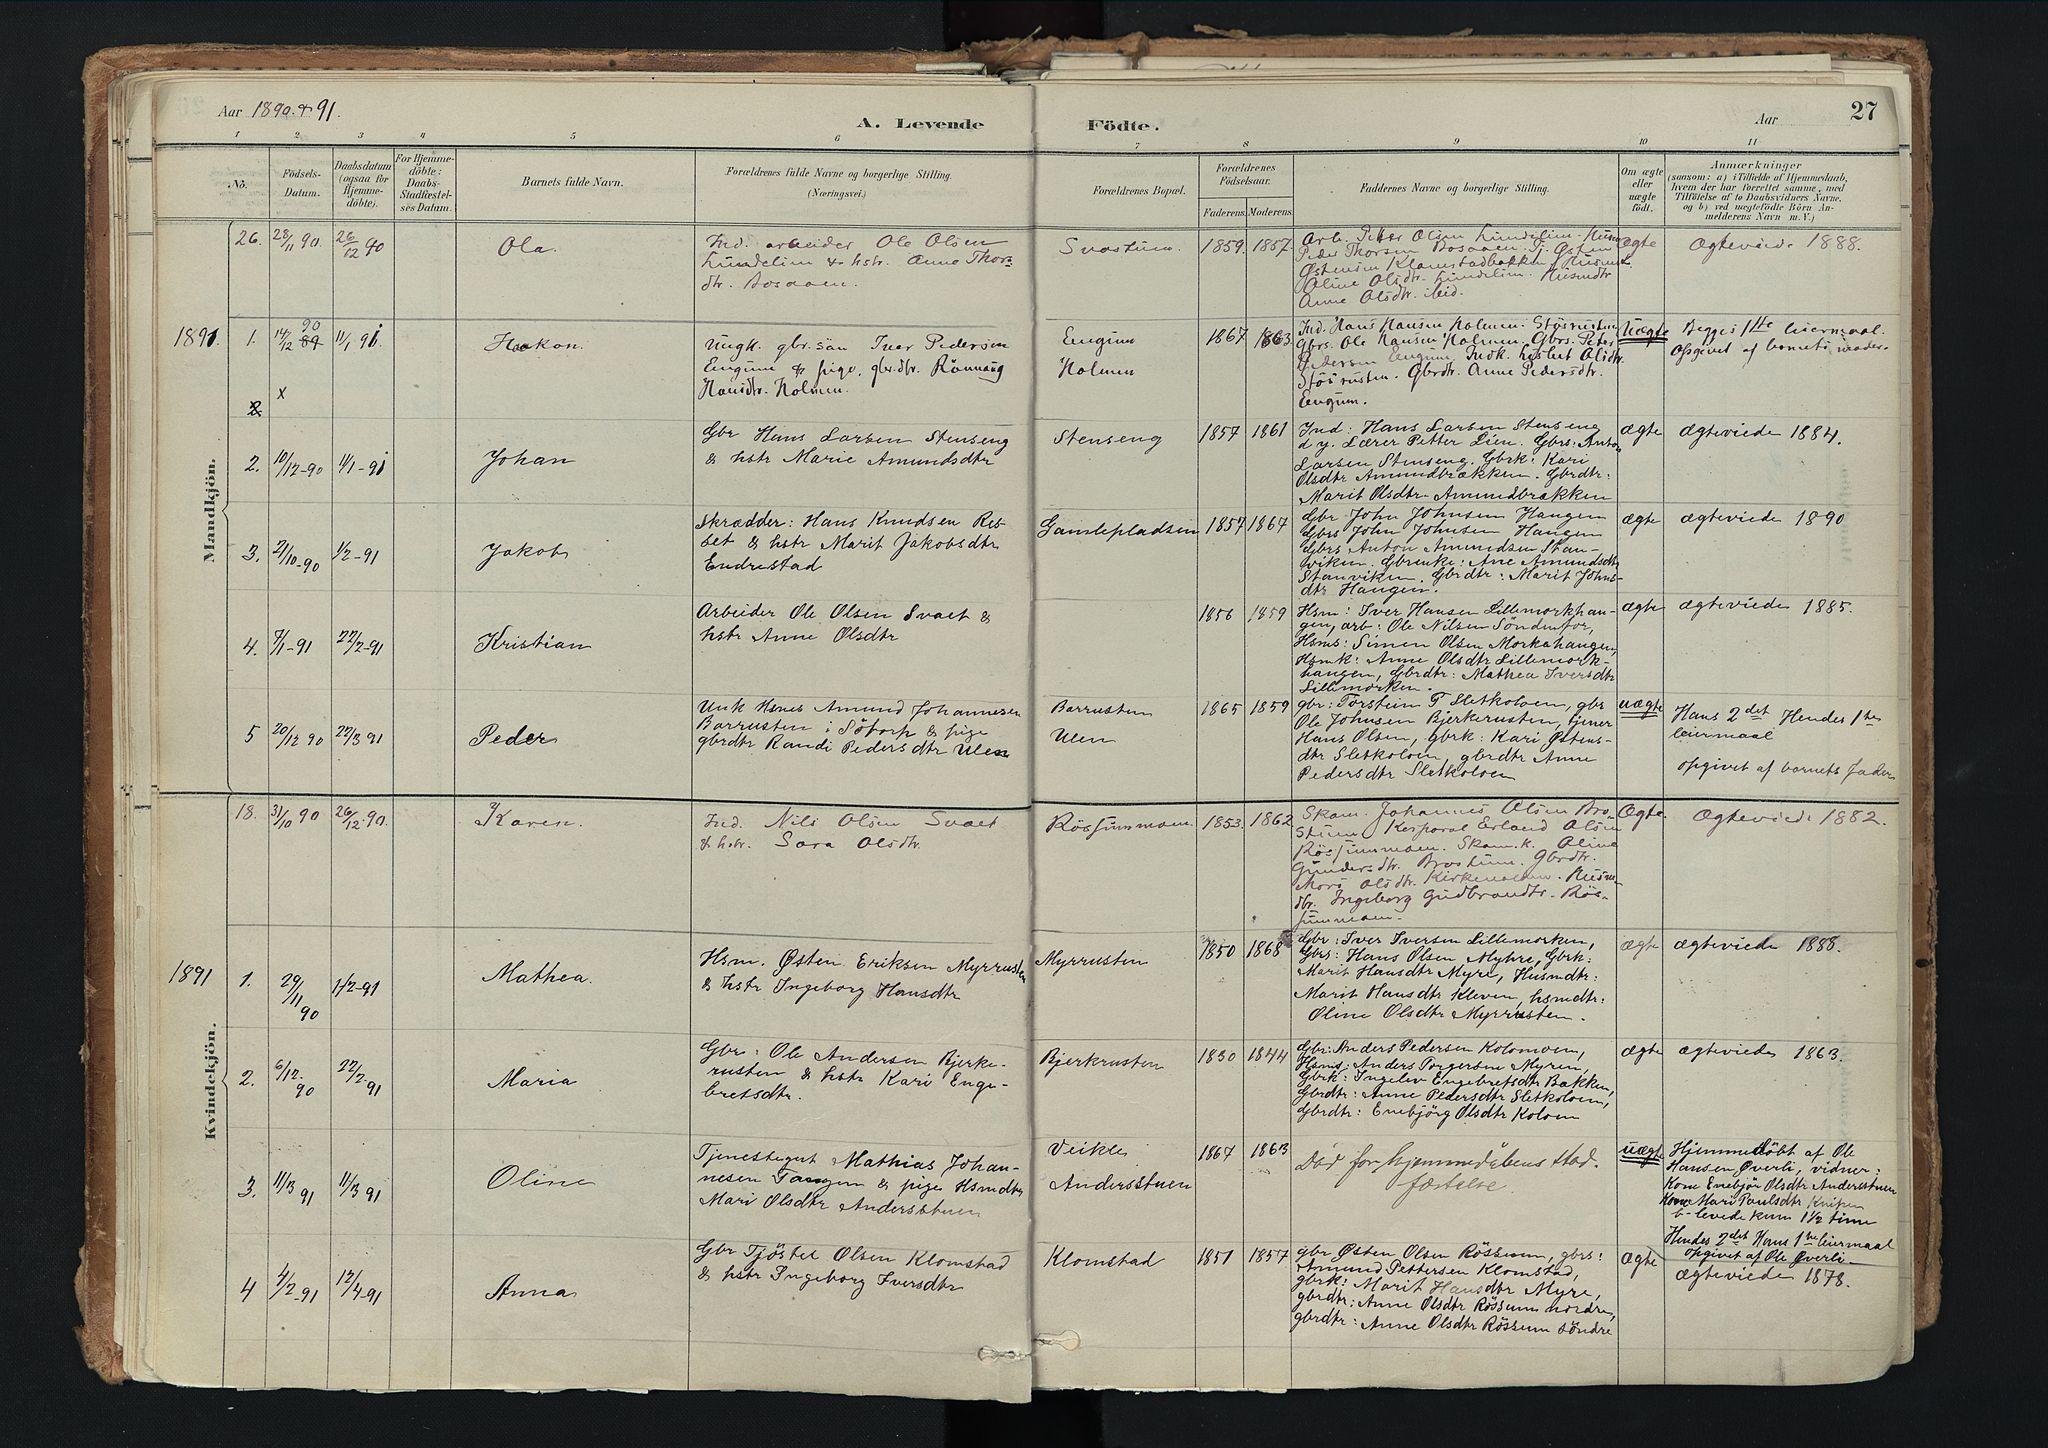 SAH, Nord-Fron prestekontor, Ministerialbok nr. 3, 1884-1914, s. 27